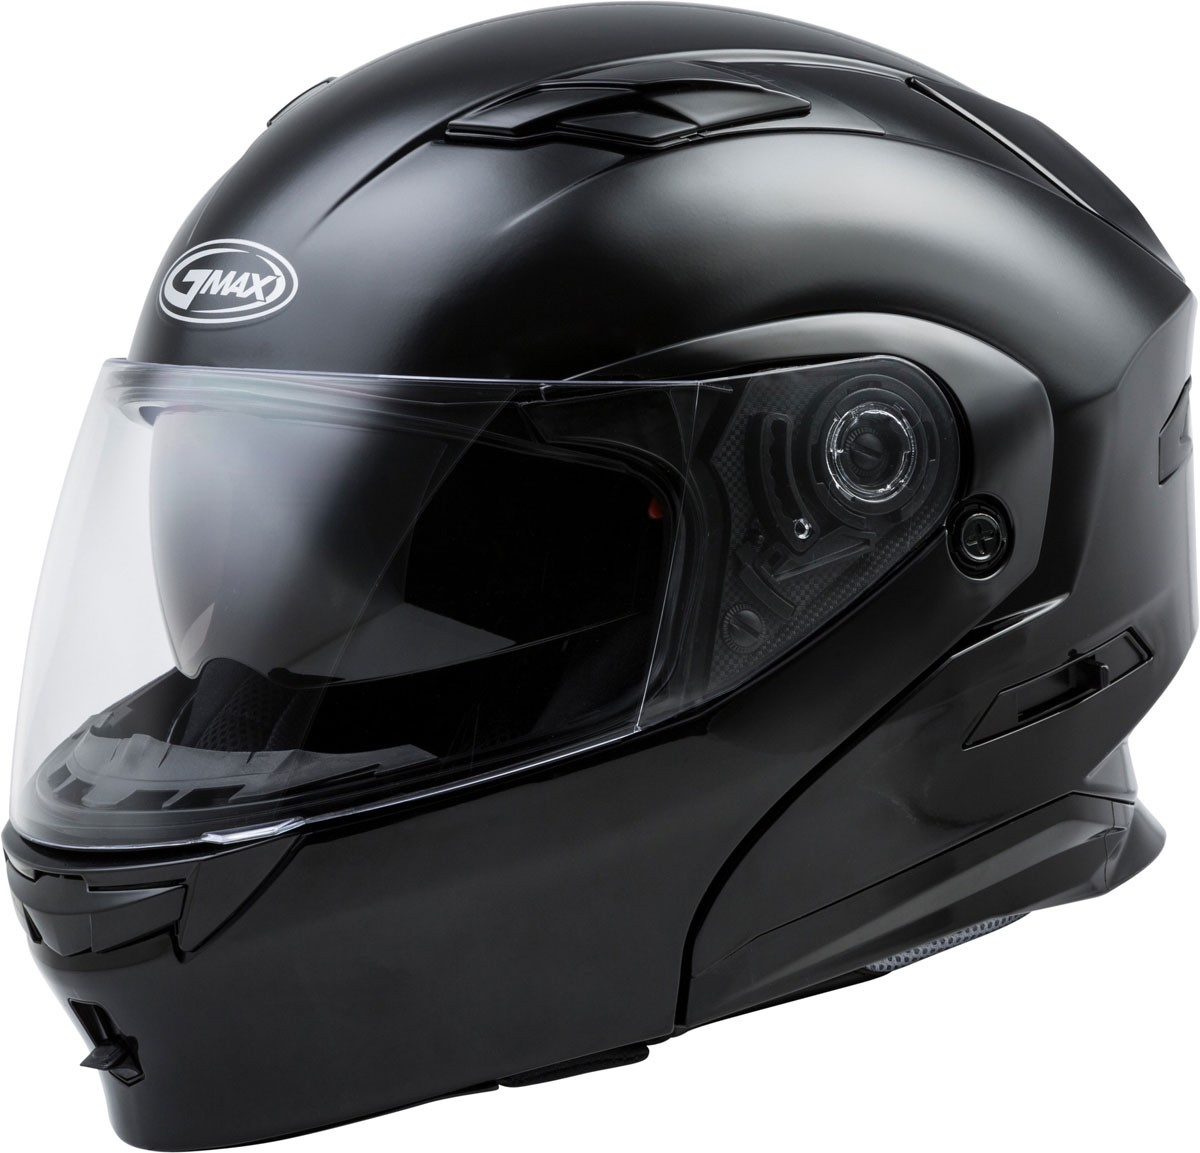 GMAX MD-01 Modular Flip-Up Motorcycle Helmet w Drop-Down Sun Visor (Gloss  Black) 9da23a8c543